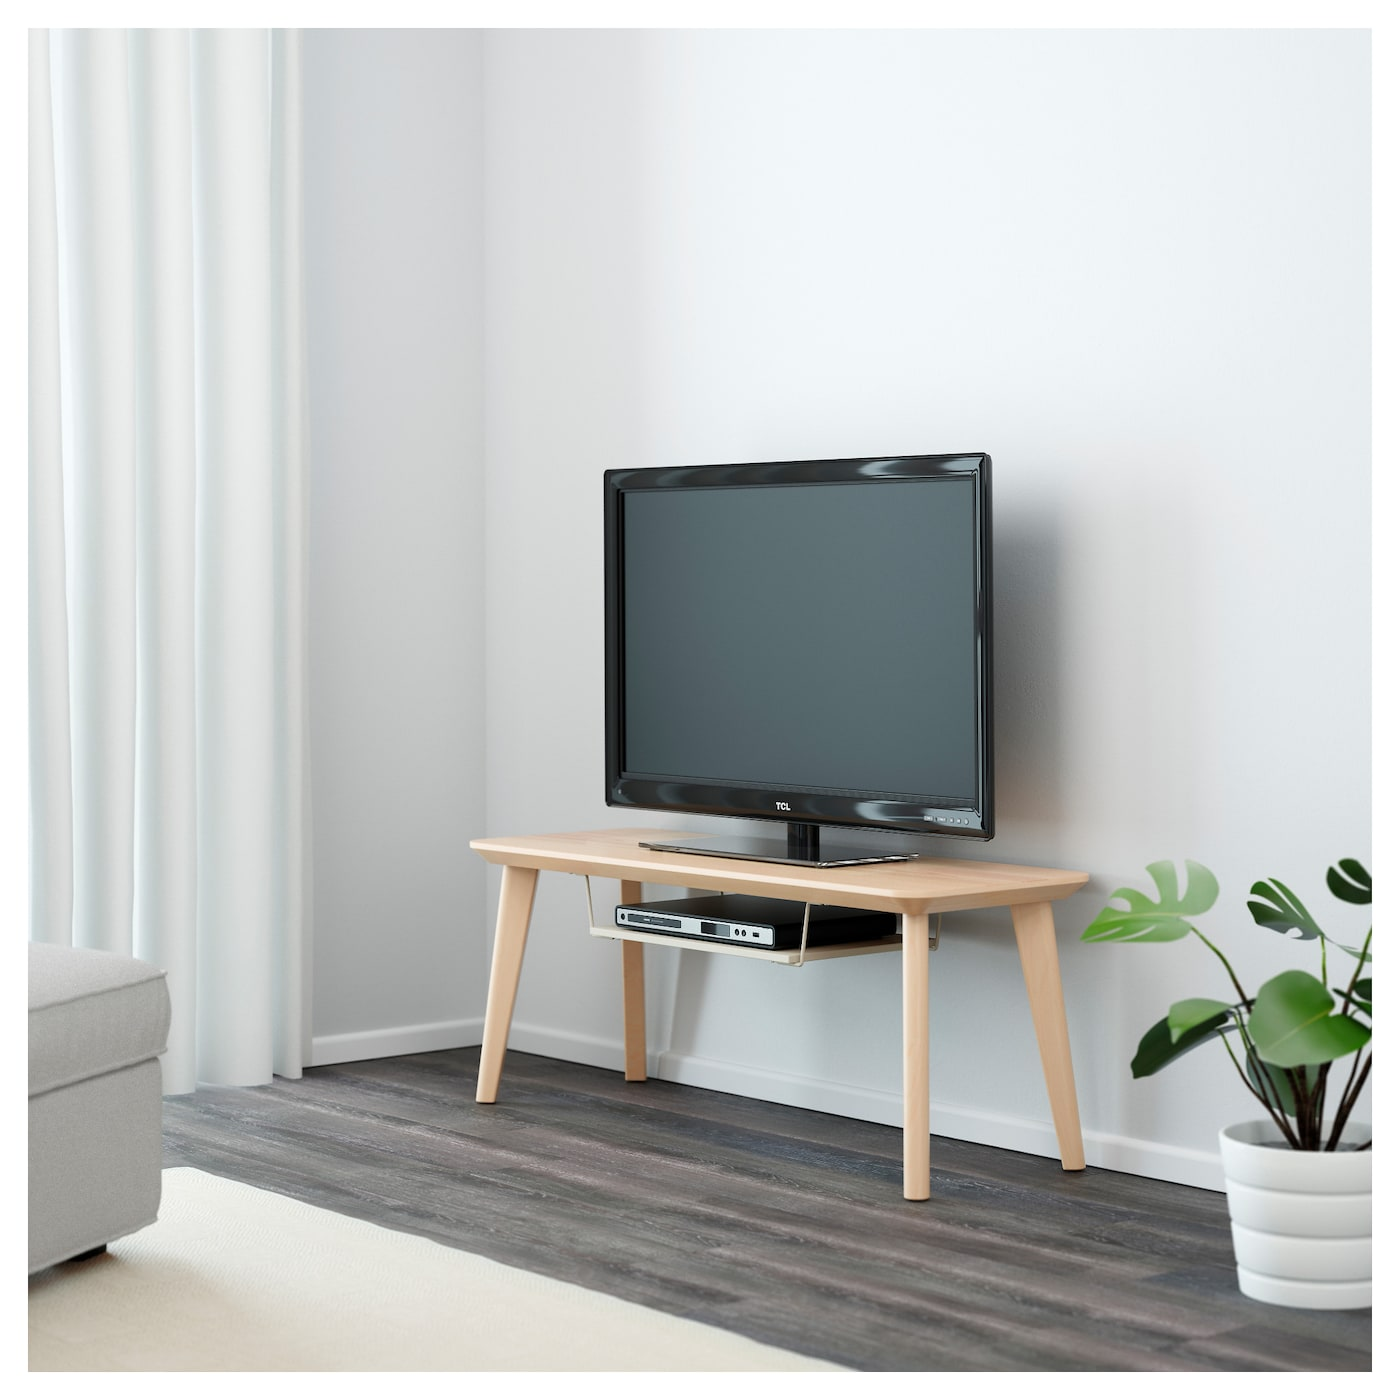 Lisabo Banc Tv Plaqu Fr Ne 114×40 Cm Ikea # Meuble Tv Artisanal